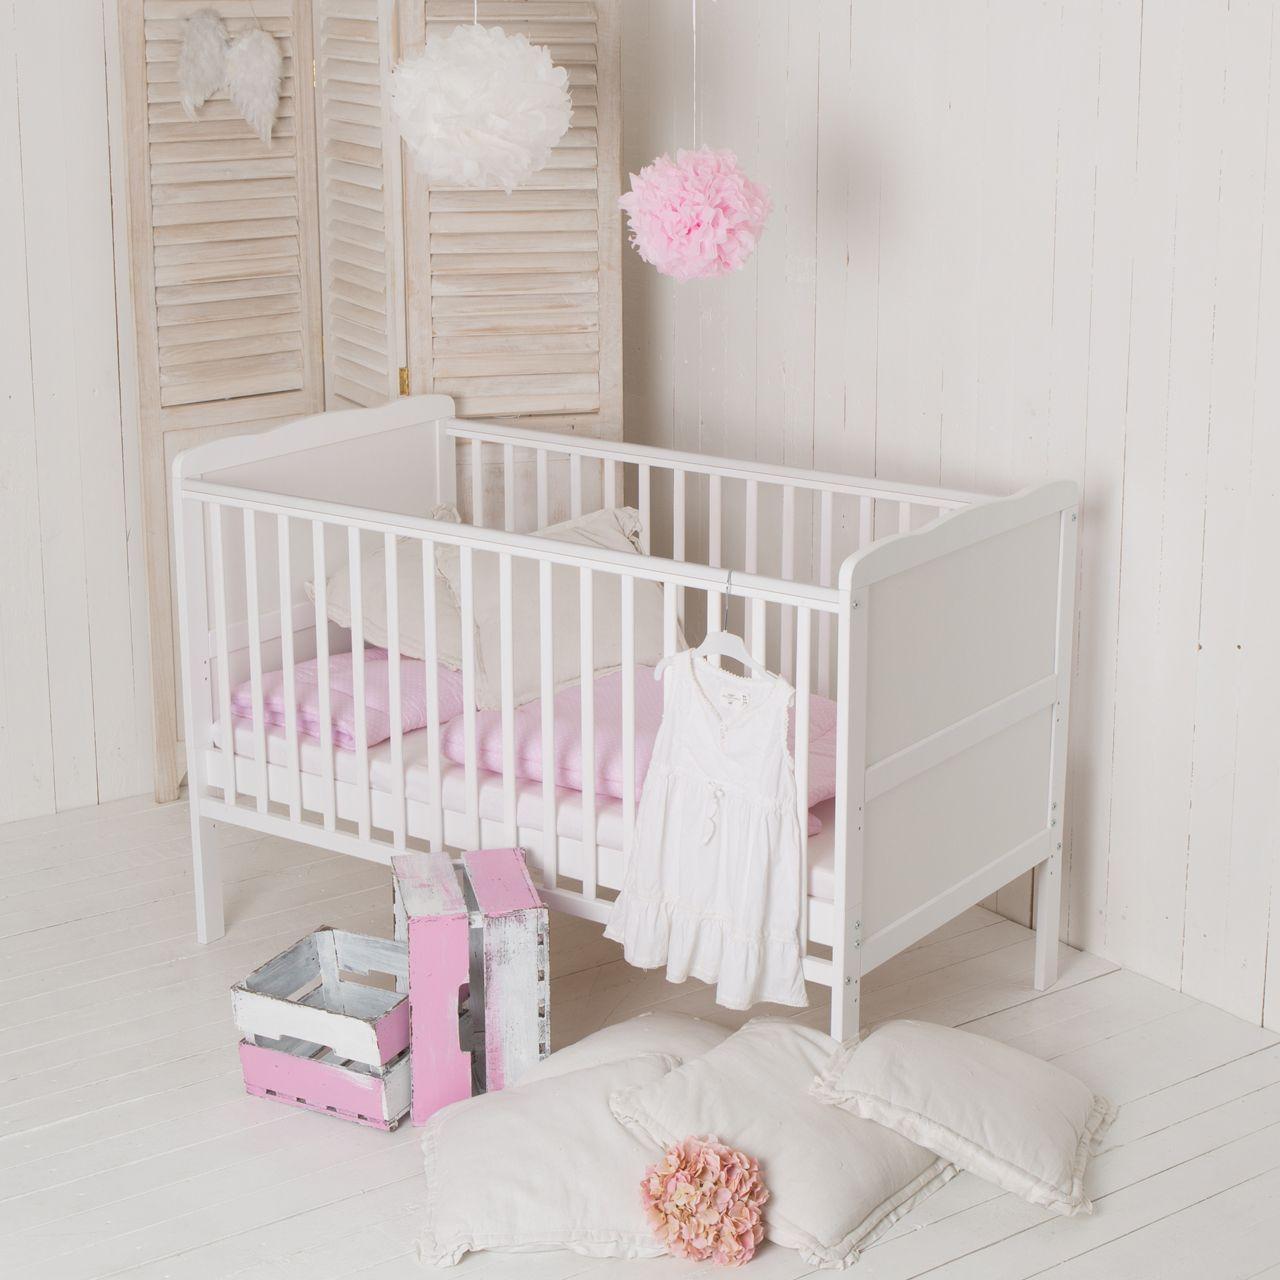 f r s e tr ume puckdaddy babybett wolke 140x70cm und zum kinderbett umbaubar. Black Bedroom Furniture Sets. Home Design Ideas